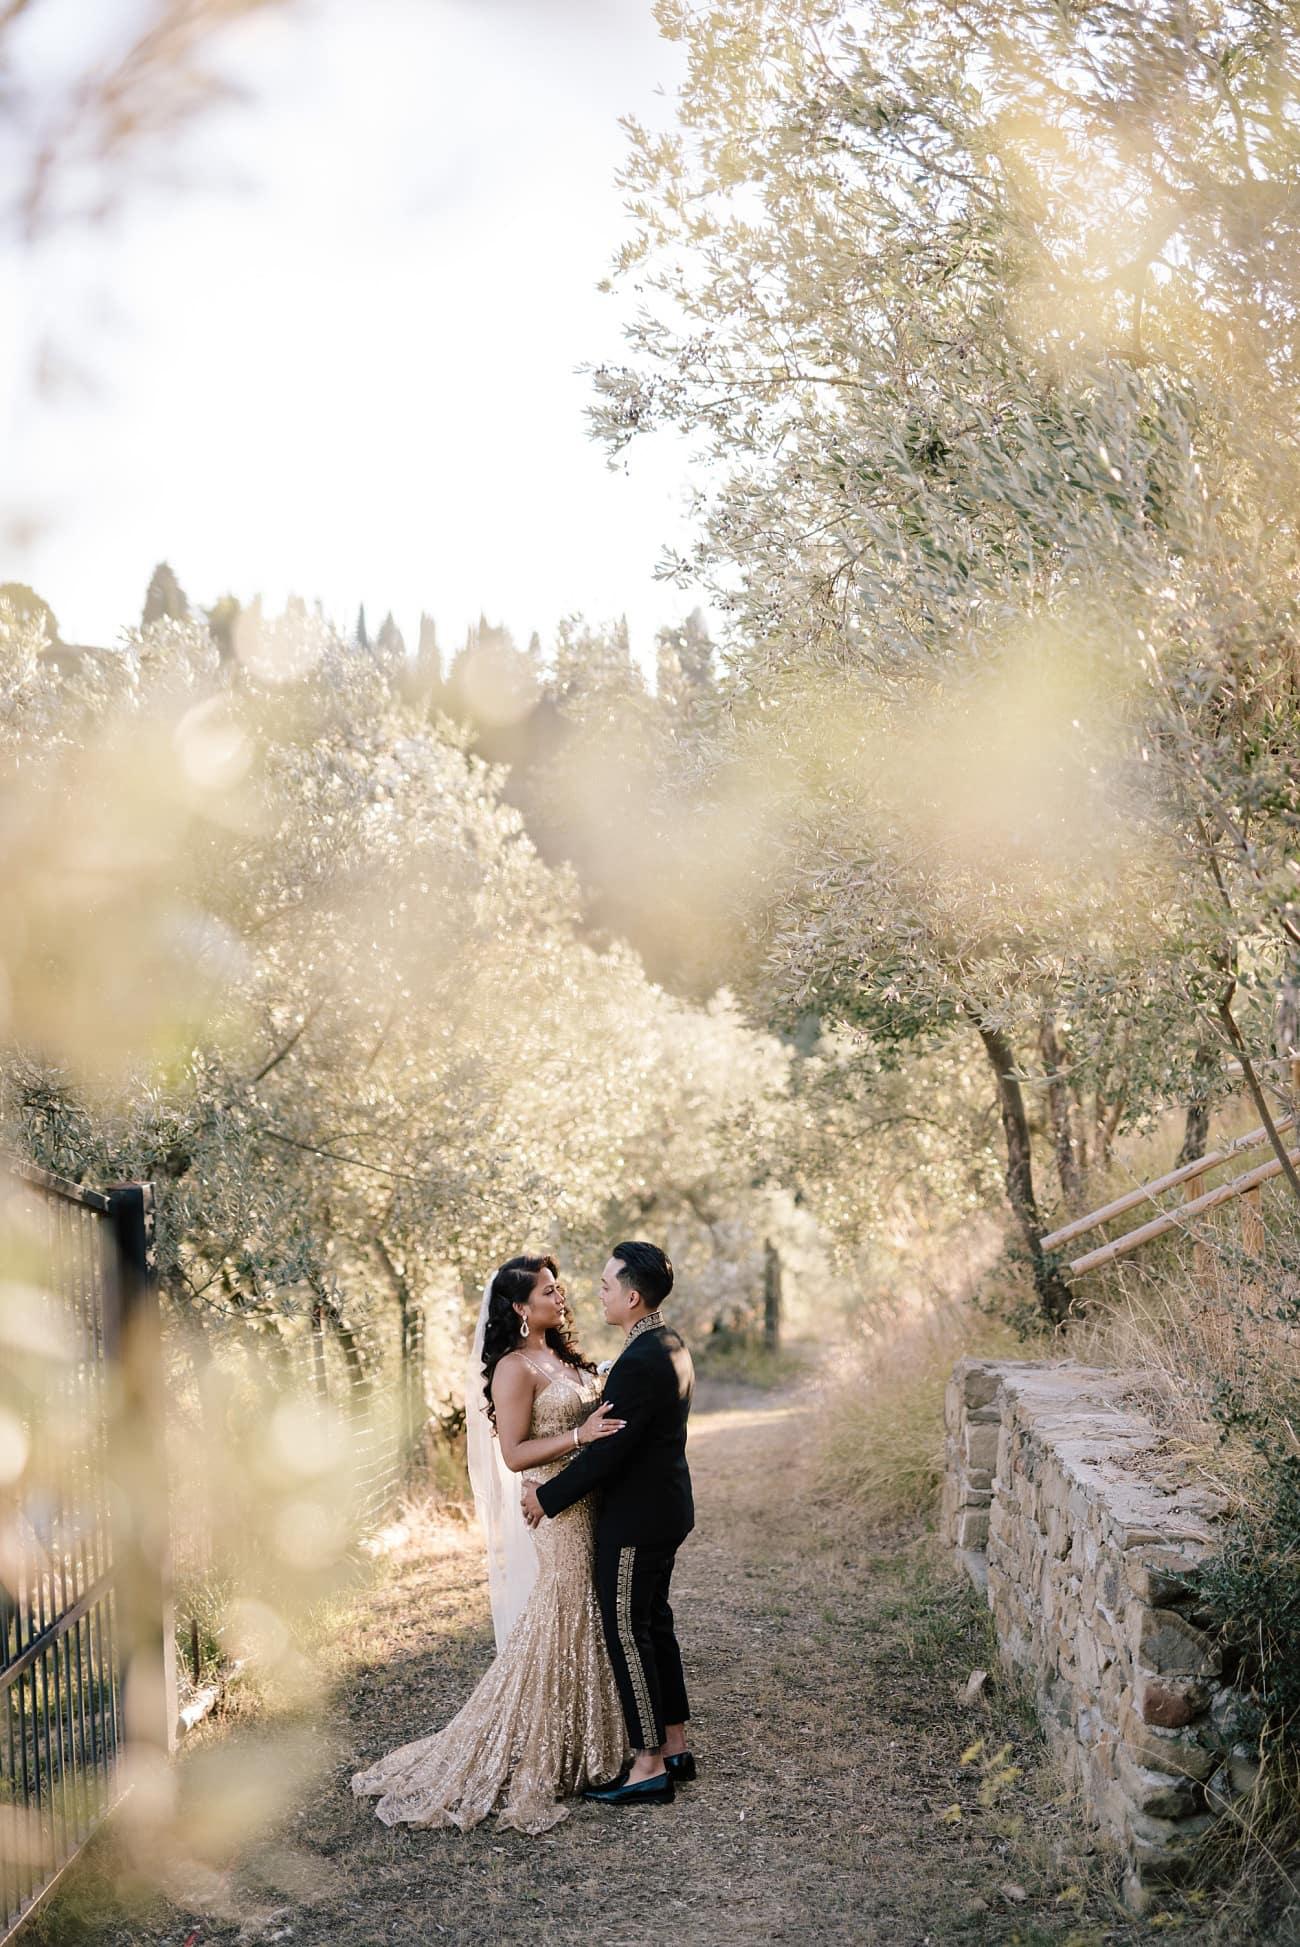 Destination Wedding in Chianti, Tuscany